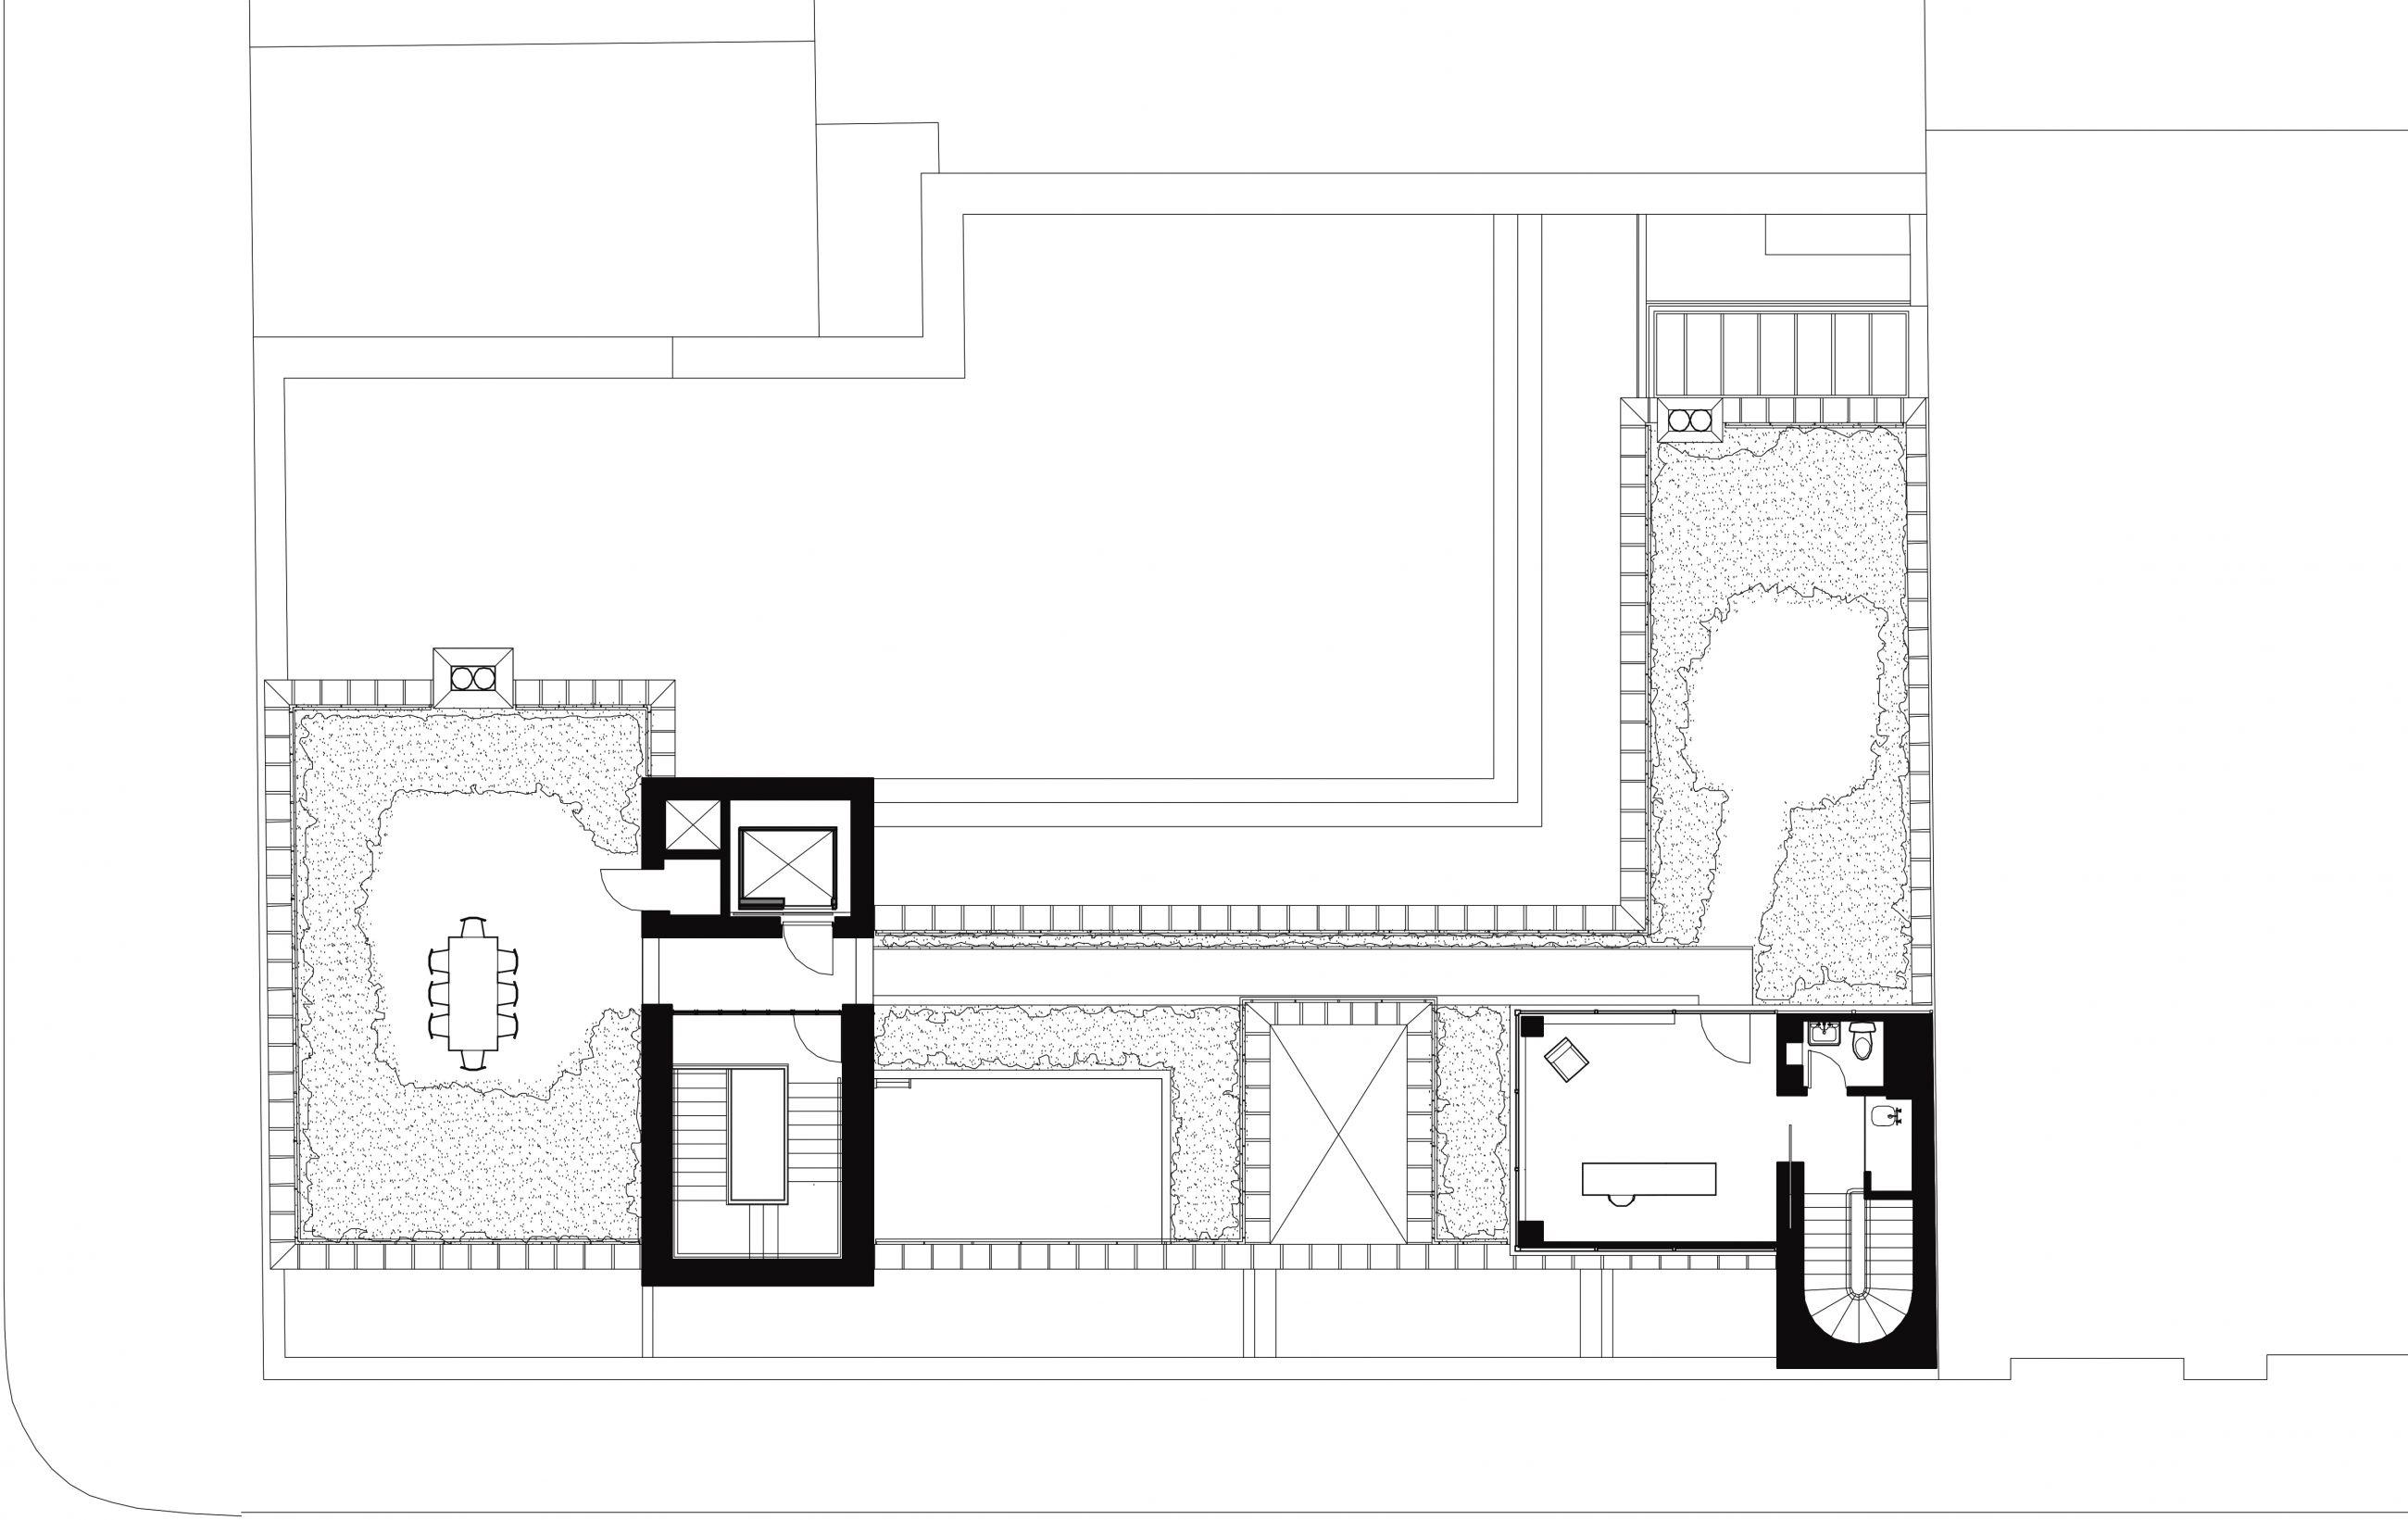 West Village Residence 4th Floor Plan